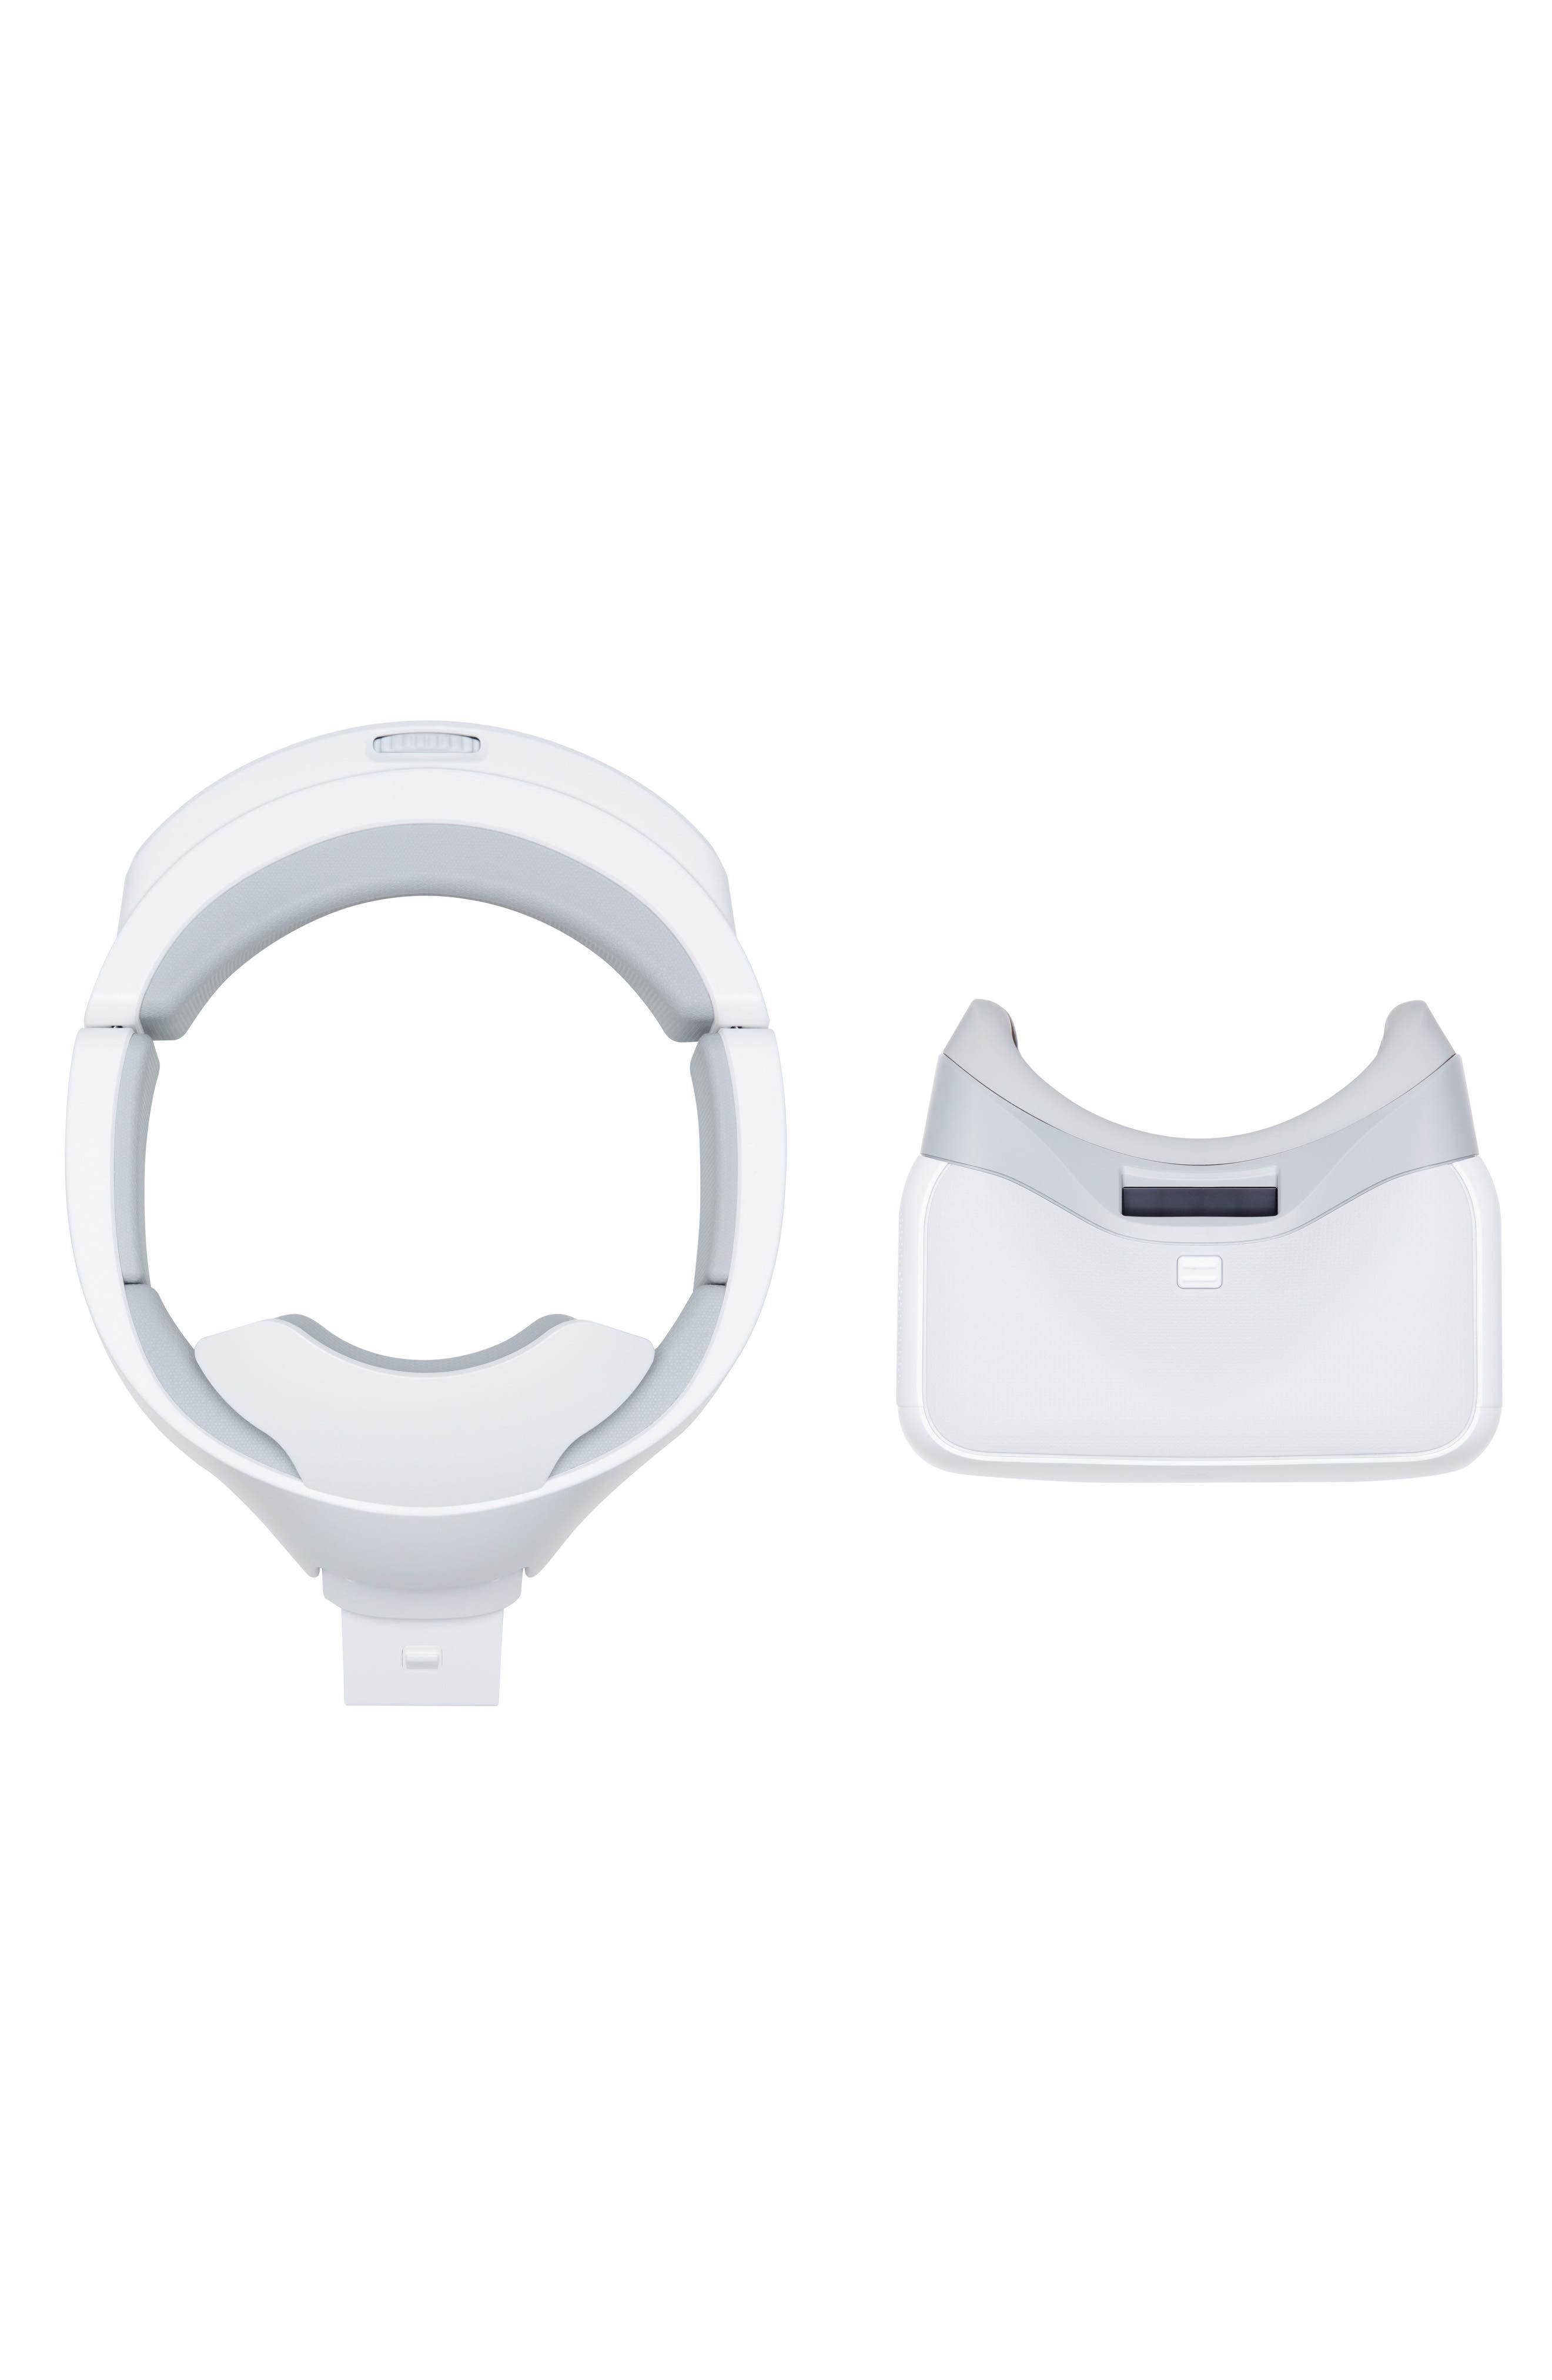 FPV Drone Goggles,                             Alternate thumbnail 4, color,                             White